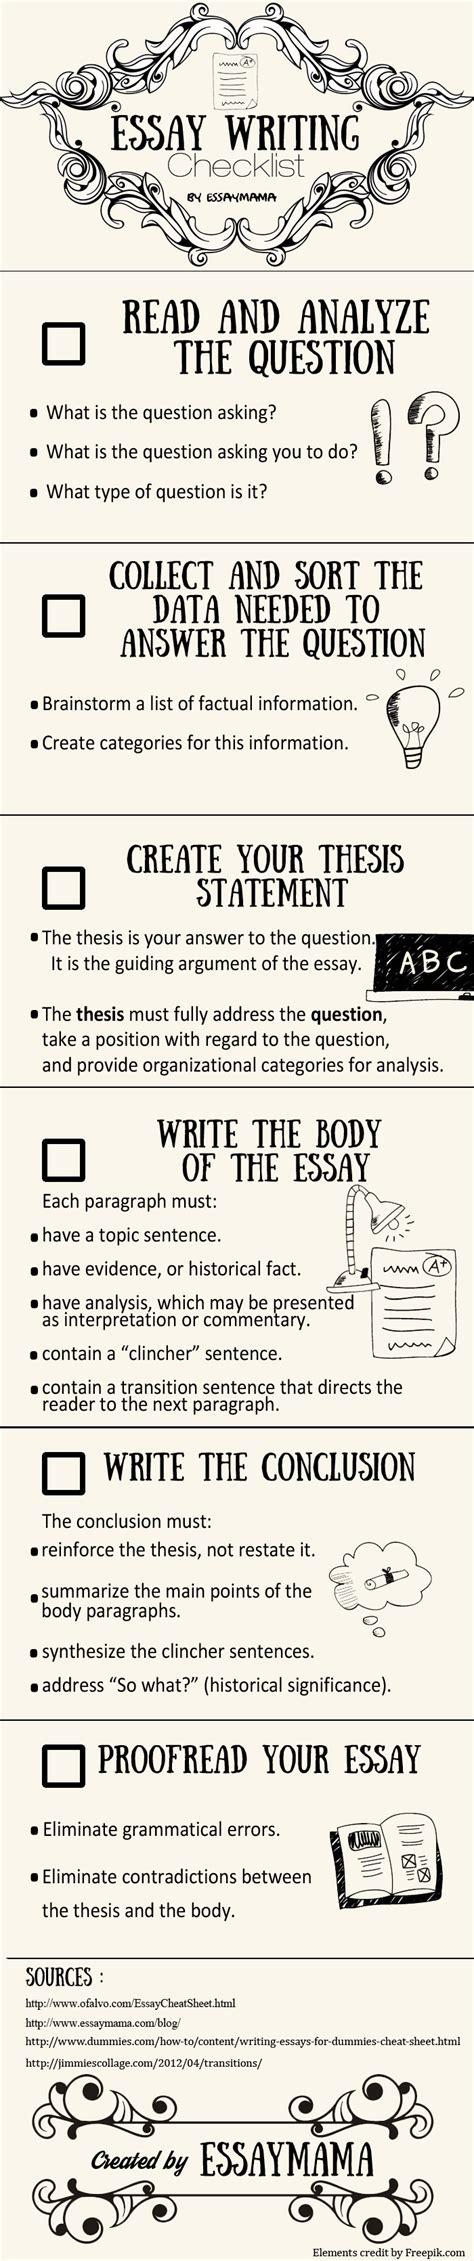 Essay Writing Checklist by Essay Writing Checklist For Brainy Students